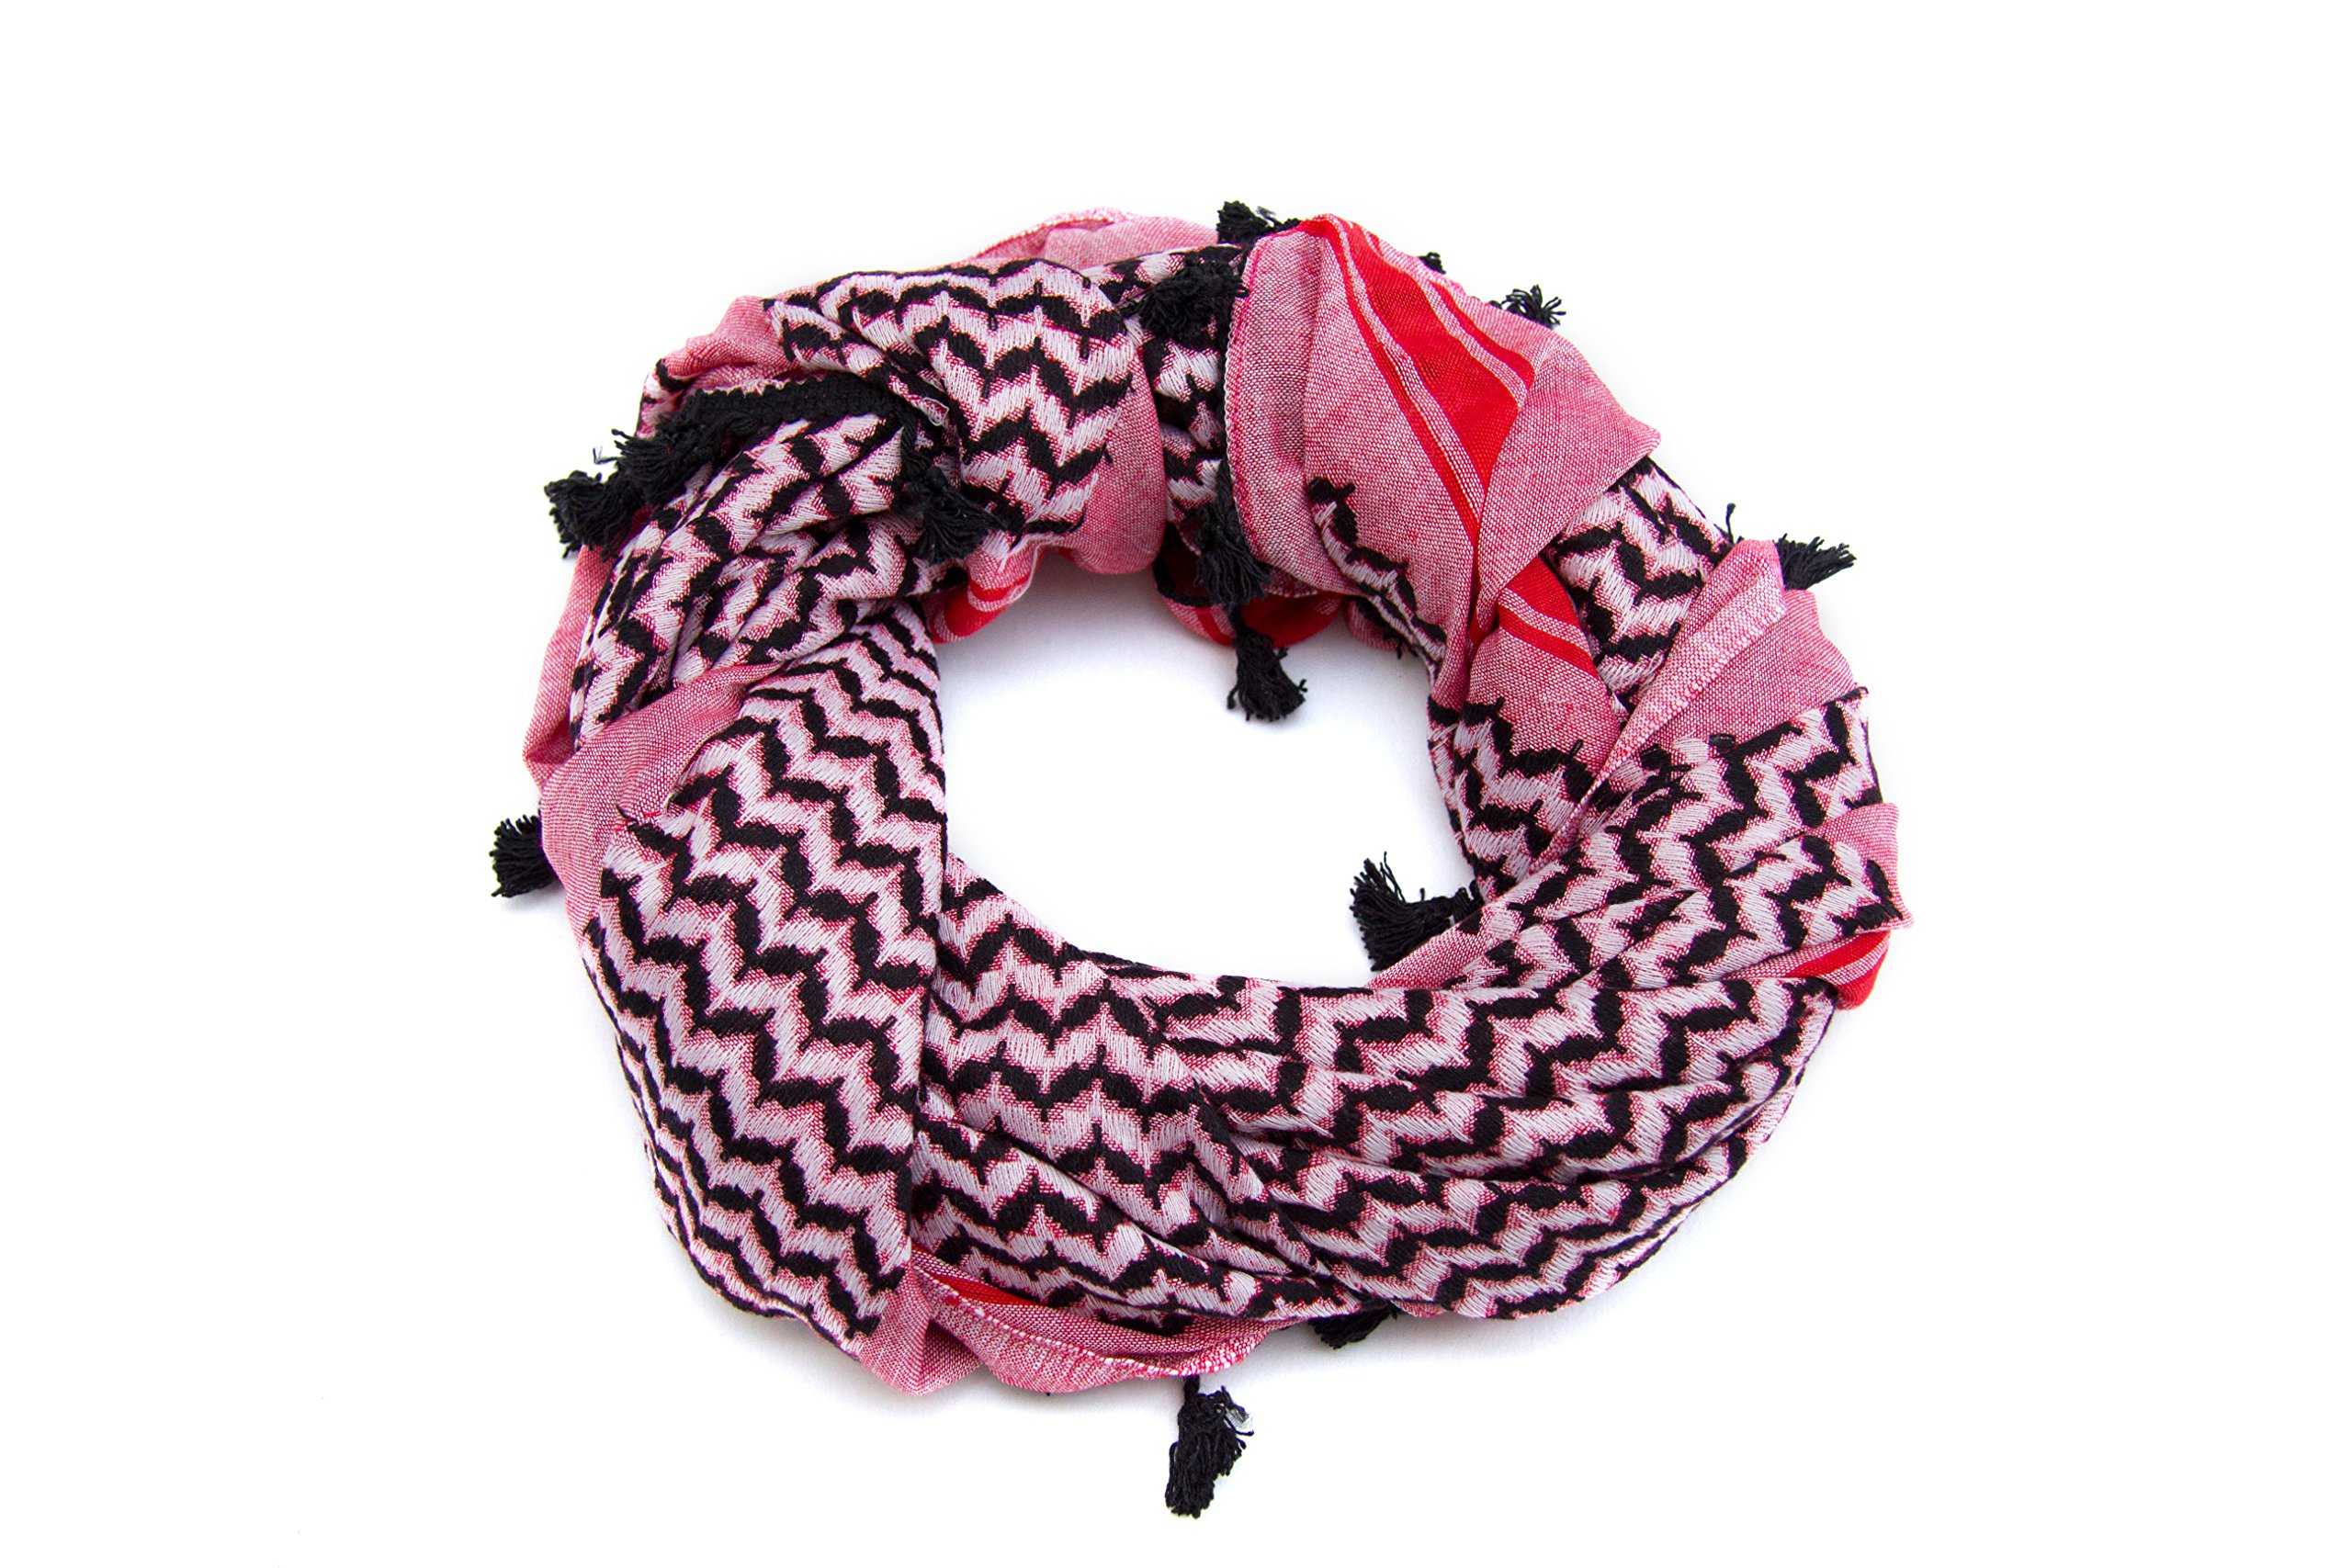 Hirbawi Premium Arabic Scarf 100% Cotton Shemagh Keffiyeh 47''x47'' Arab Scarf (Pink Zahra) Made in Palestine by Hirbawi (Image #2)